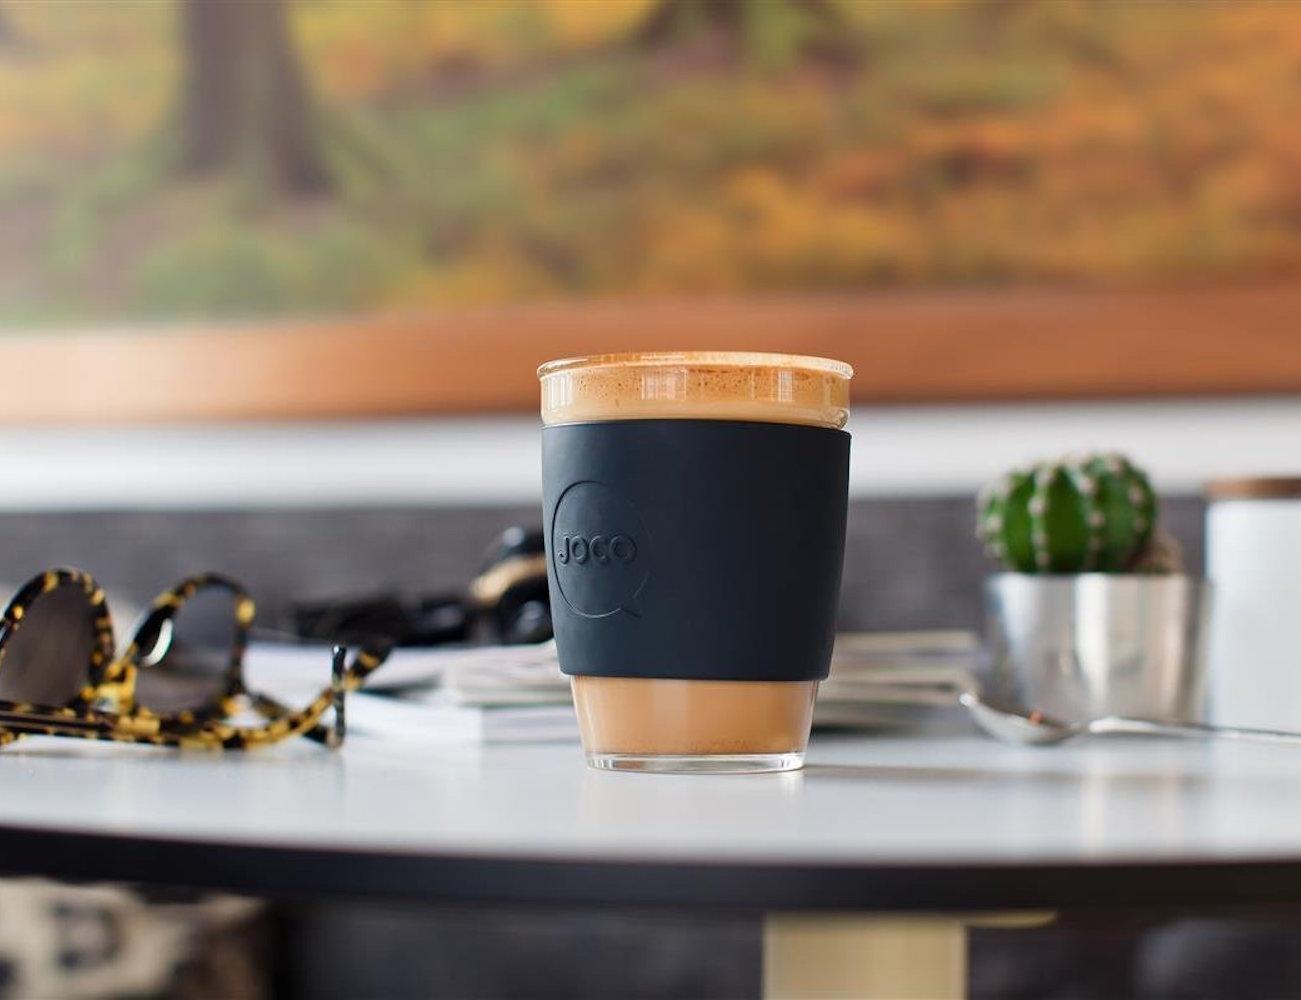 JOCO Glass – Reusable 12oz Coffee Cup